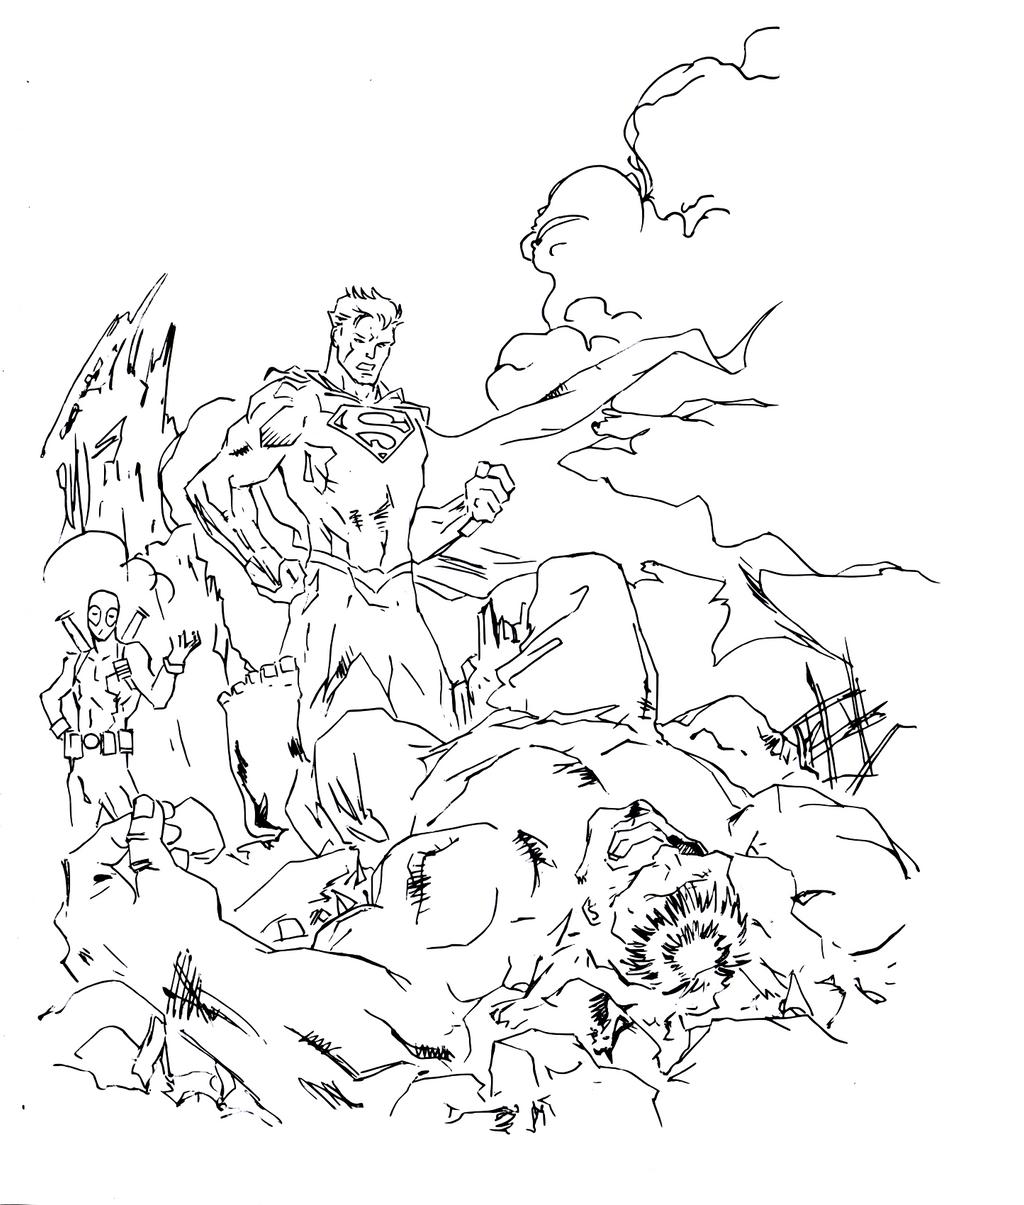 Superman vs hulk drawing (line art) by electronicdave